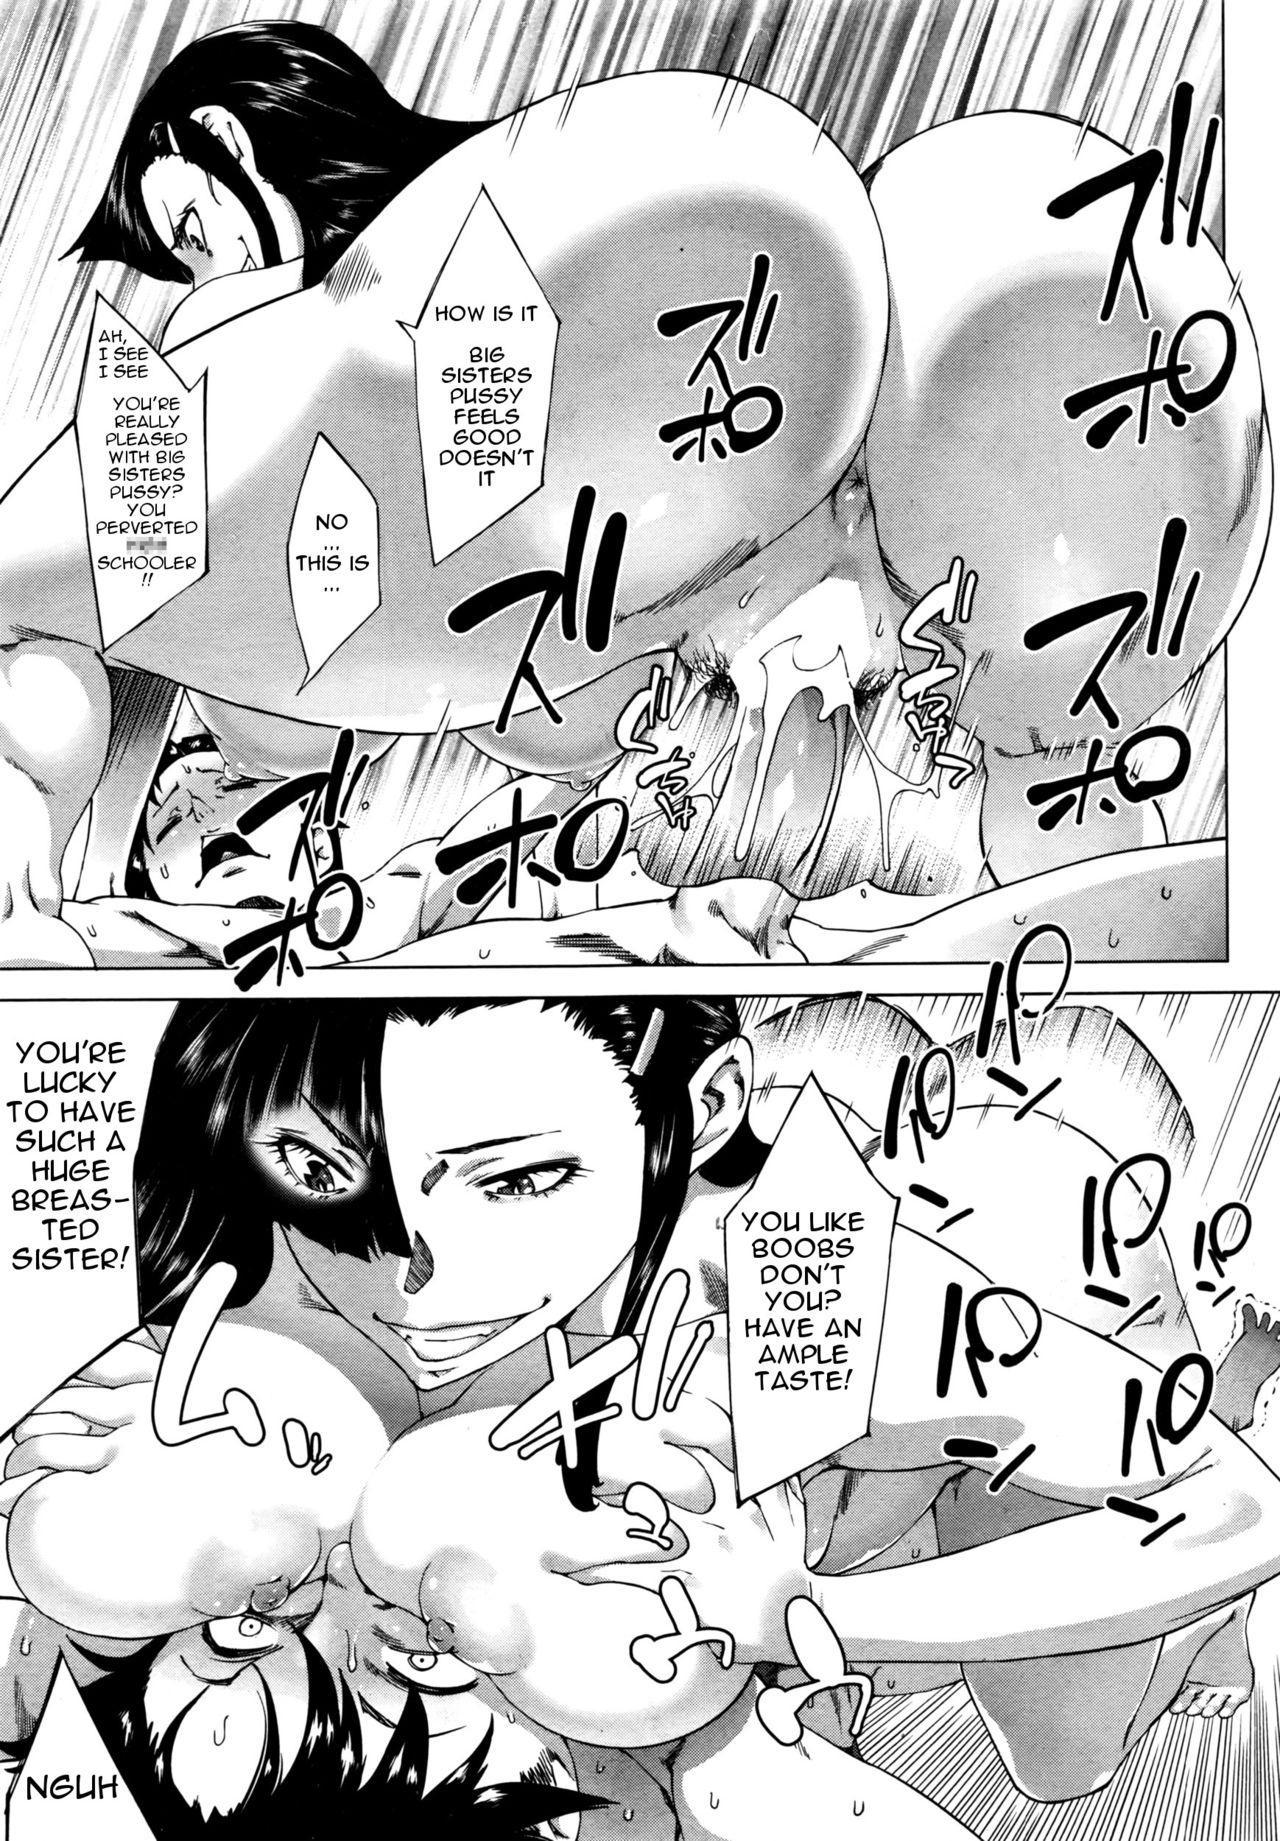 [Qdou Kei] Kaa-chan to Nee-chan ga Hidoin da yo | My mom and big sister are cruel (COMIC MILF 2016-08 Vol. 31) [English] [Januz] 24